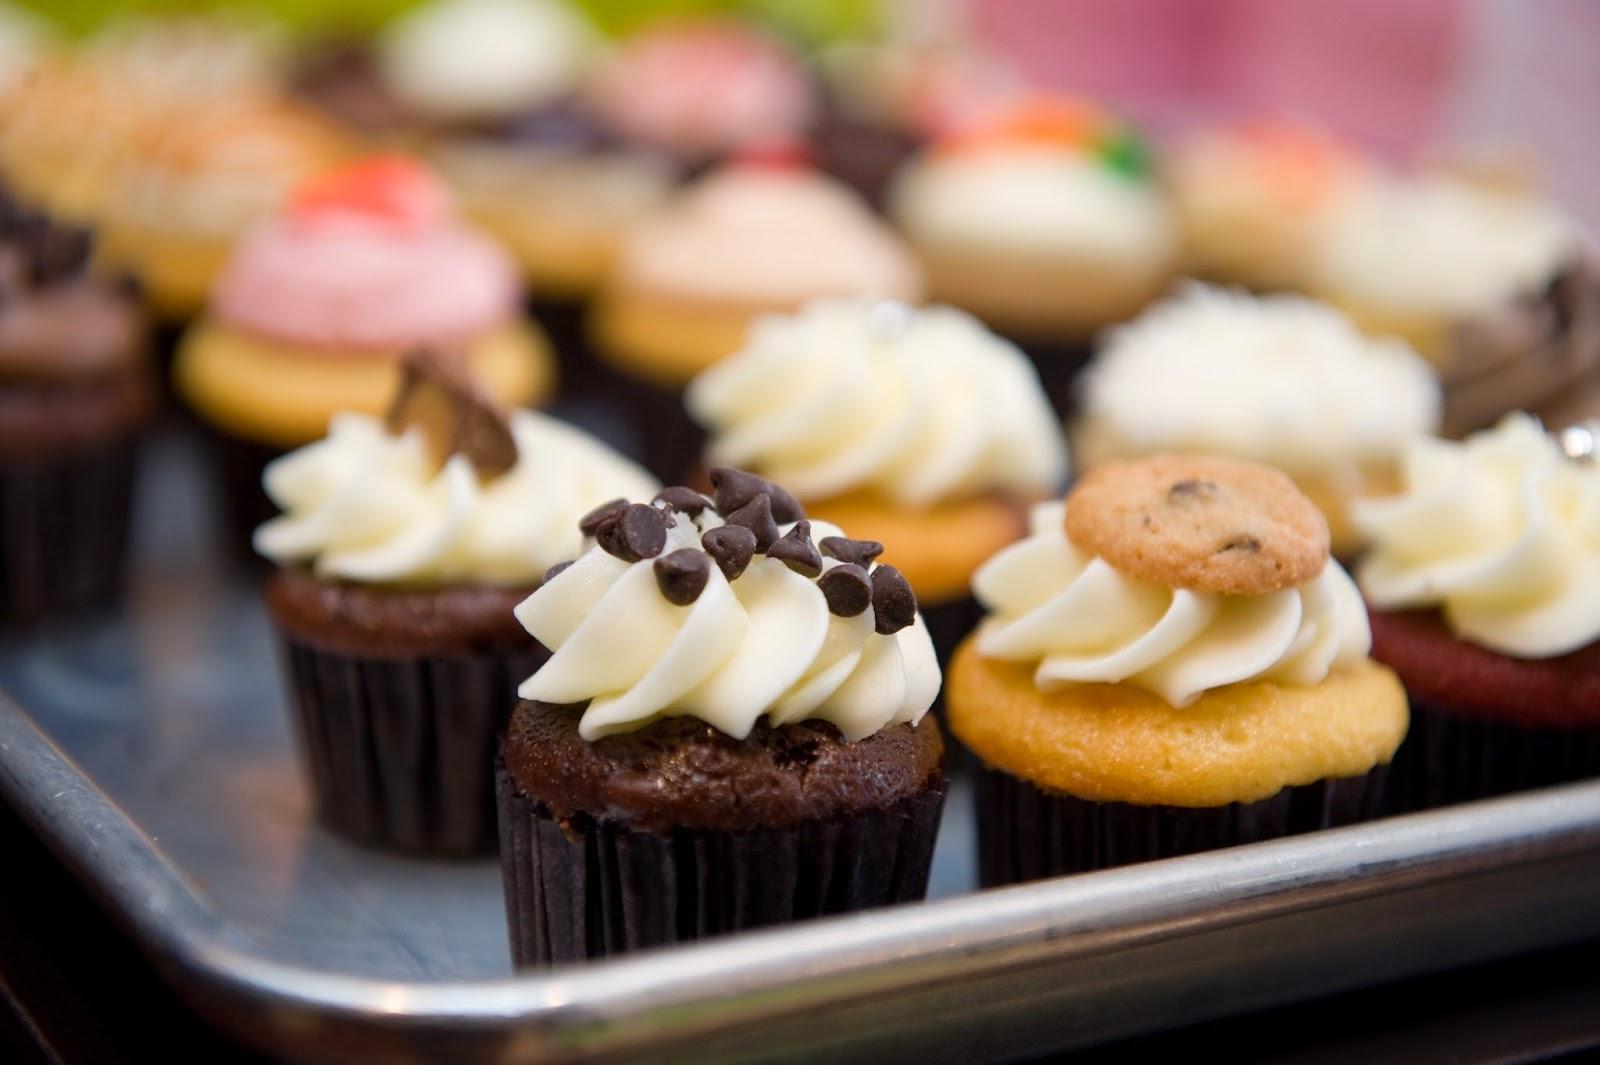 Cupcakes Pembroke Pines Pembroke Pines Location